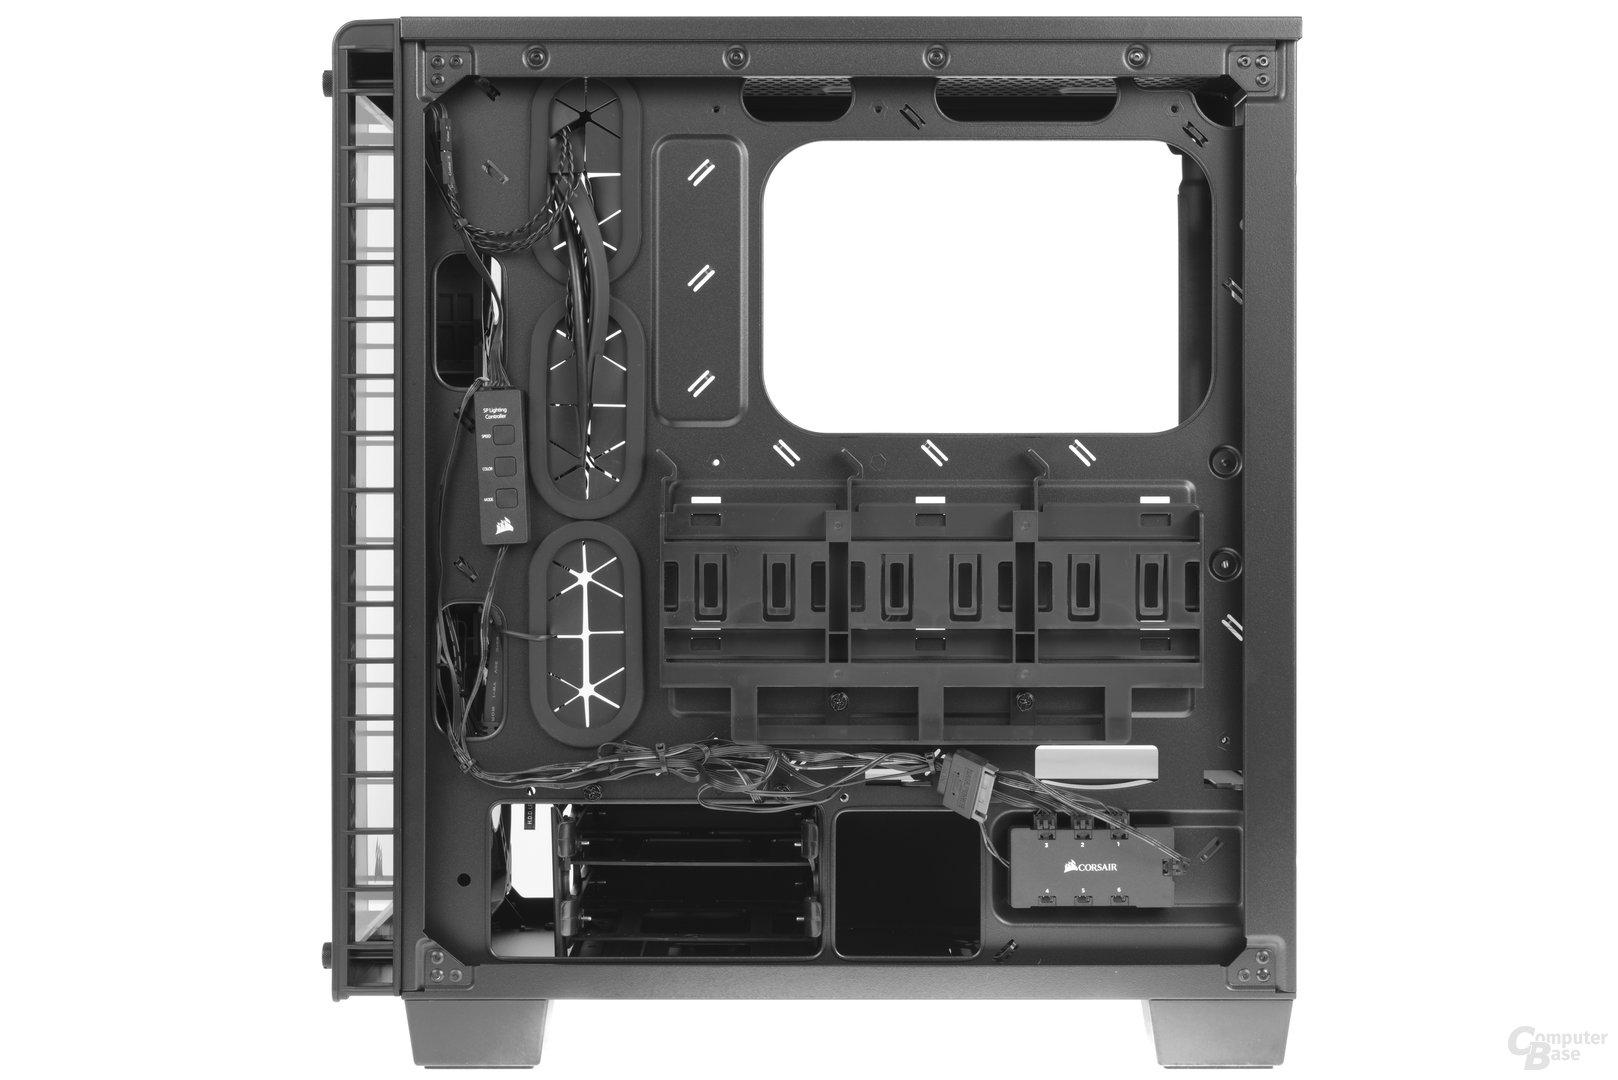 Corsair Crystal 460X RGB – Innenraumansicht Rückseite